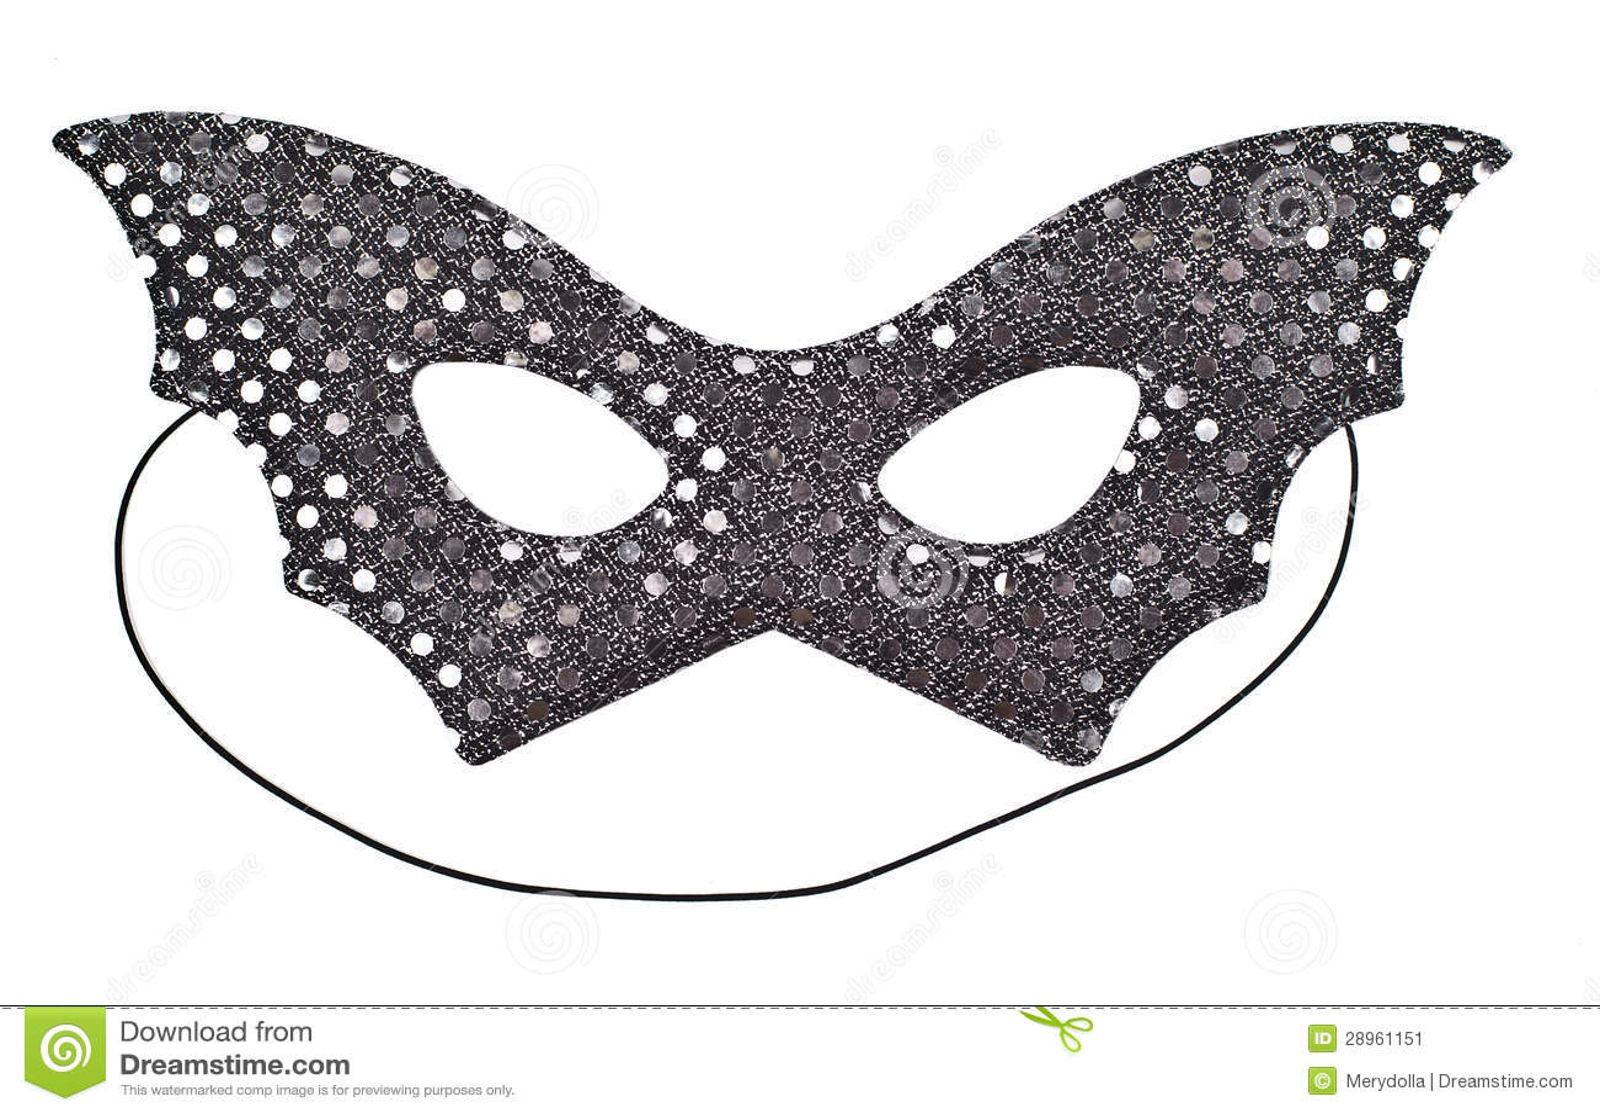 Karnawał maska